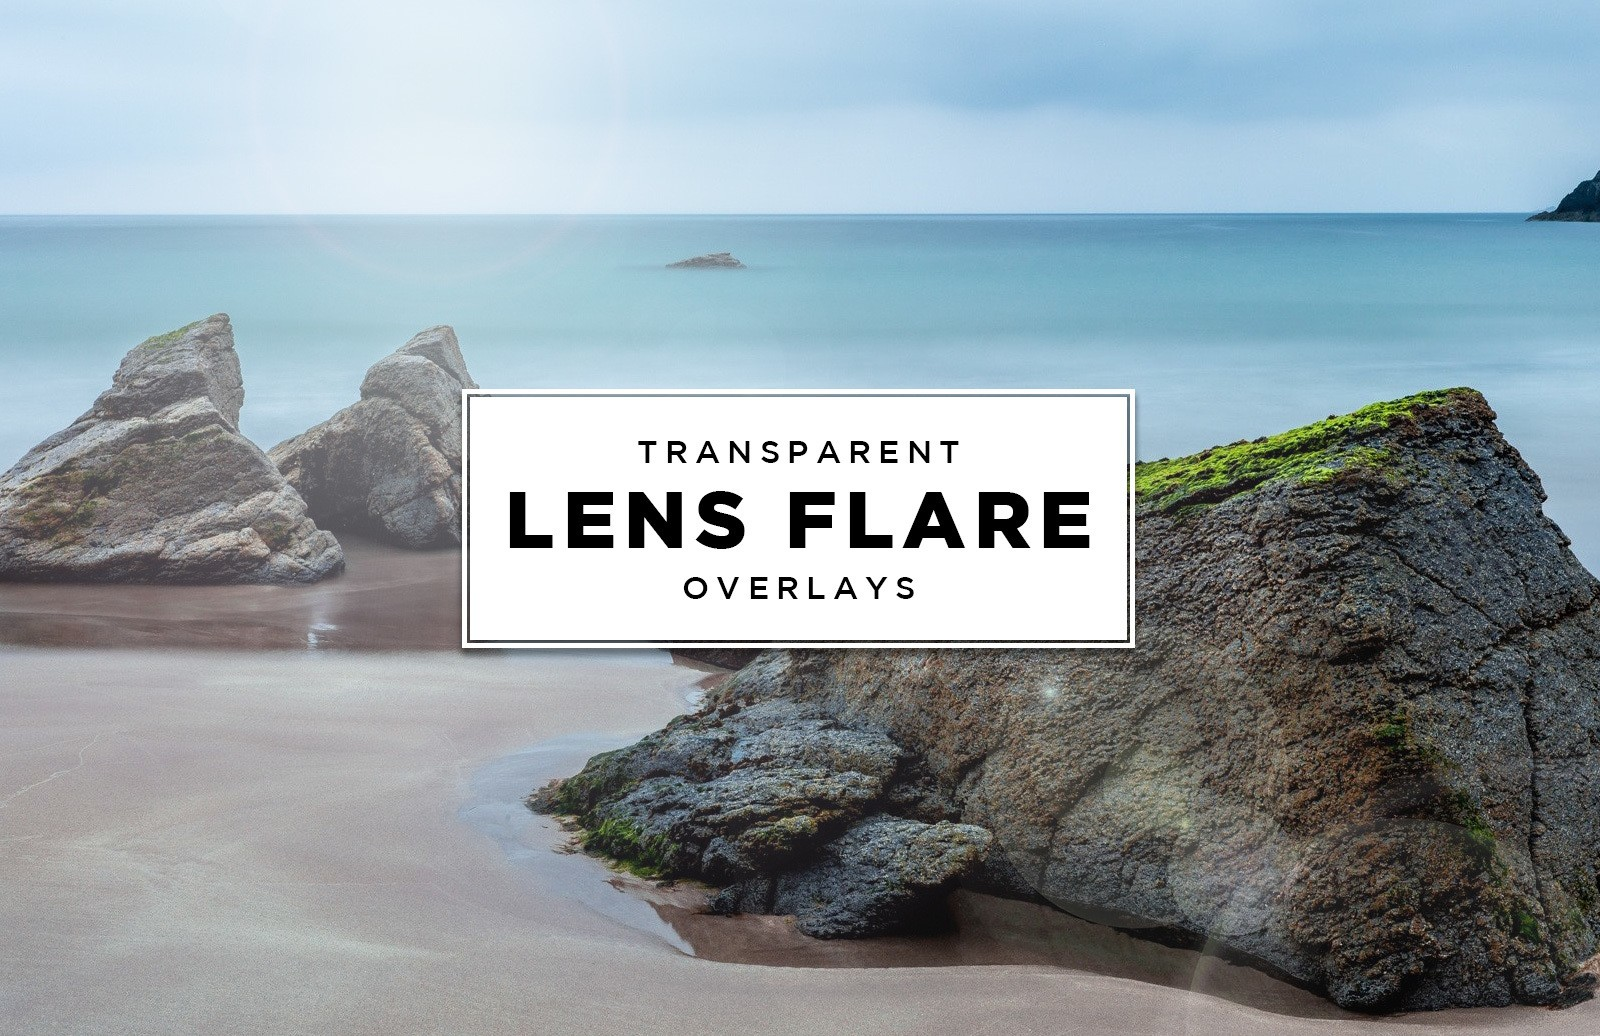 Transparent Lens Flare Overlays